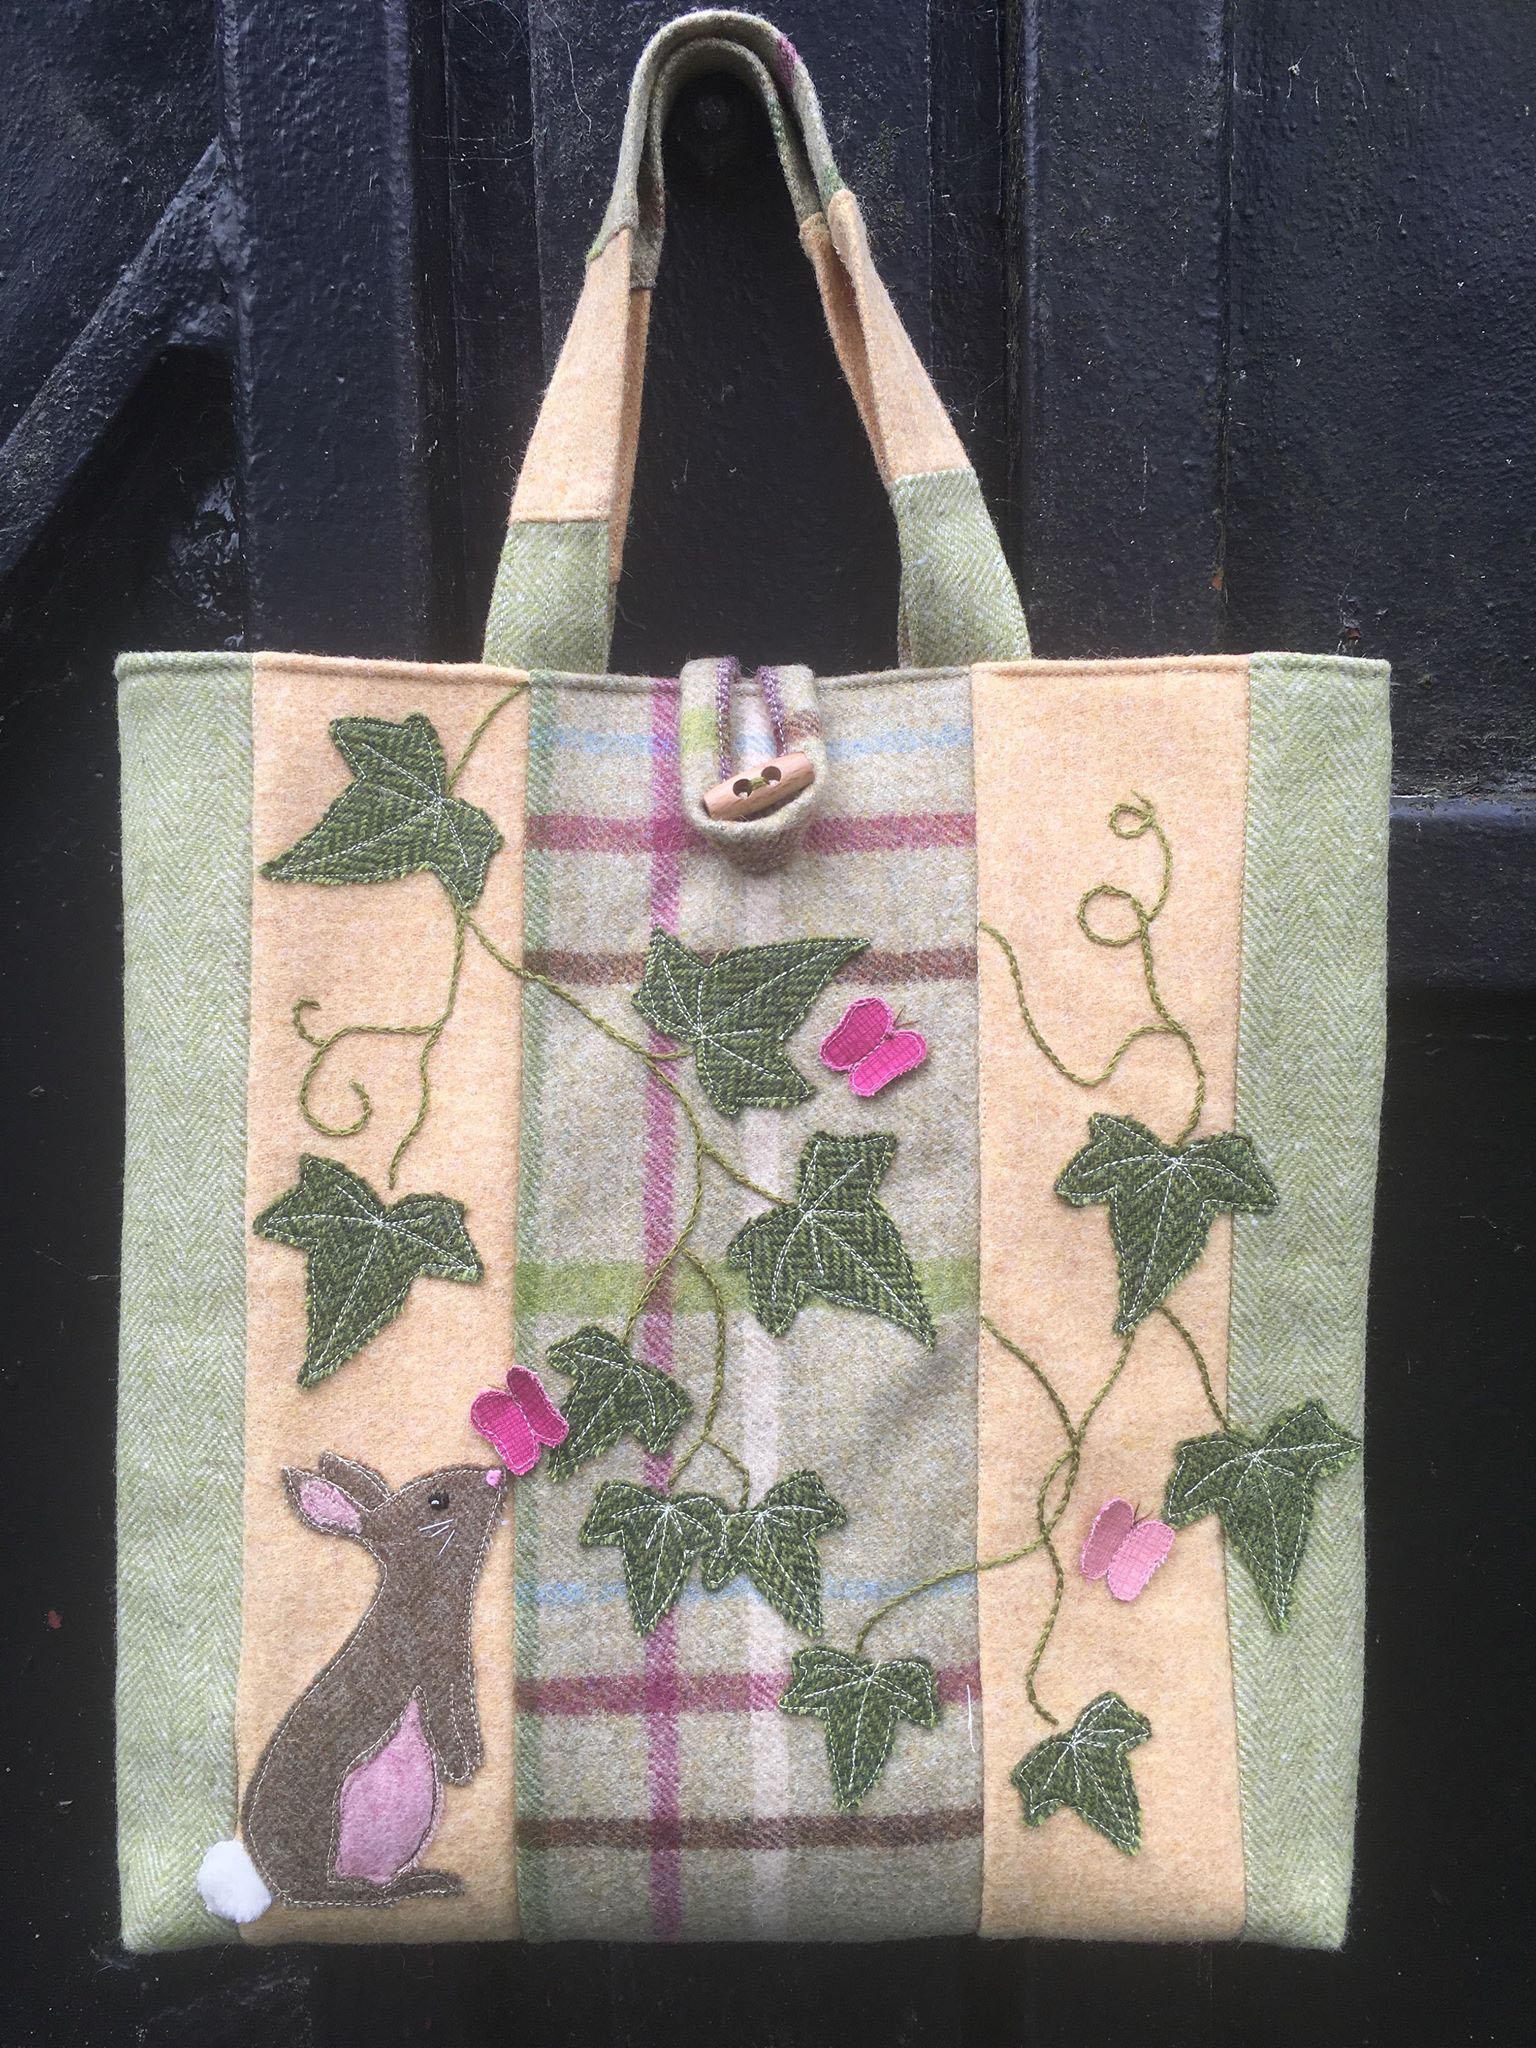 Maria's Bag Tote Bag Sewing Pattern.